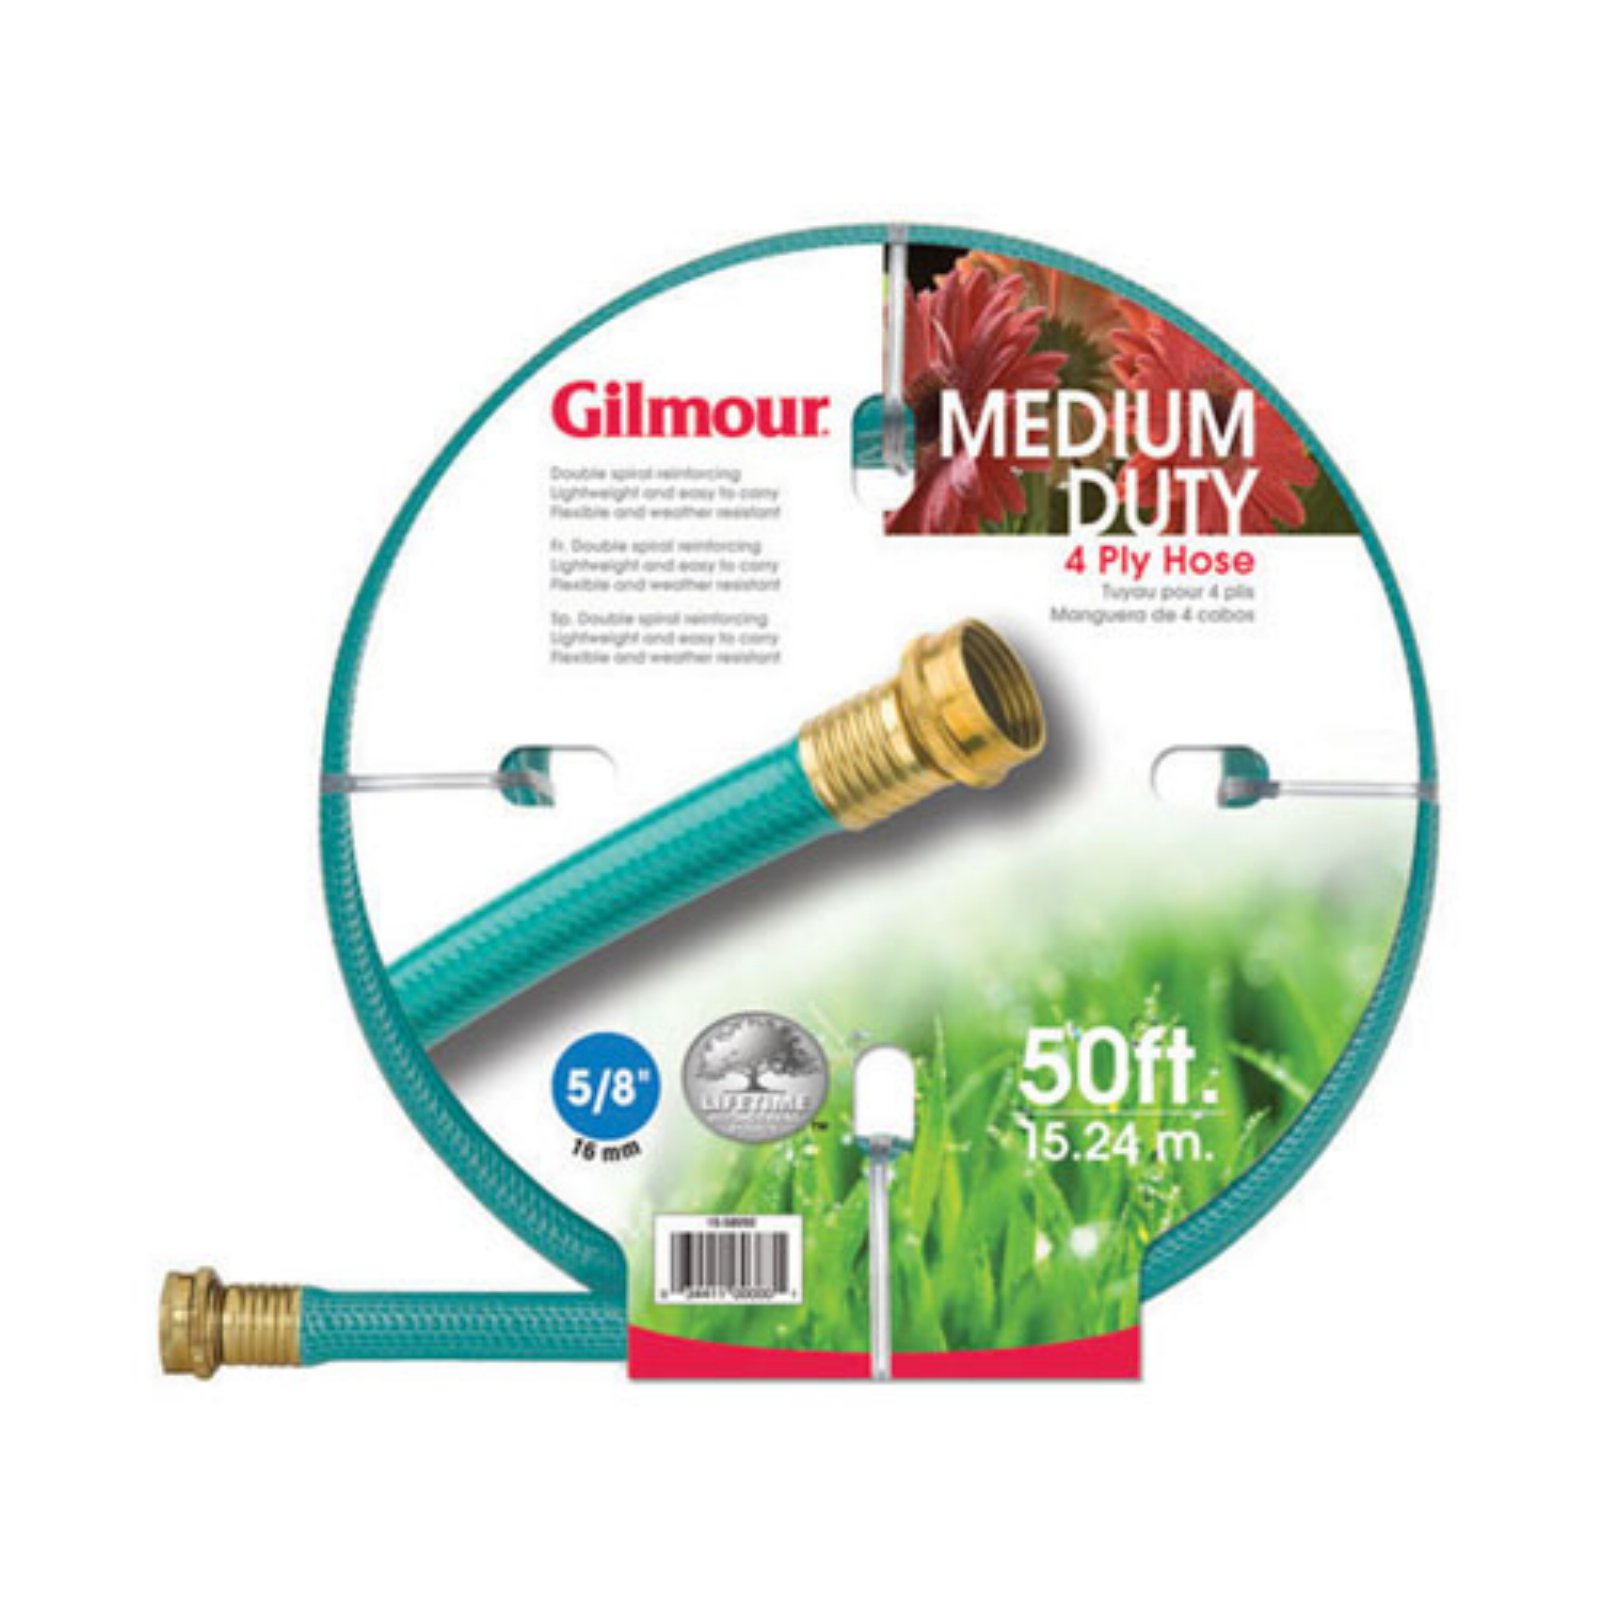 "Gilmour 15058050 5 8"" x 50' 4 Ply Reinforced Vinyl Garden Hose by Fiskars Brands Inc Watering"